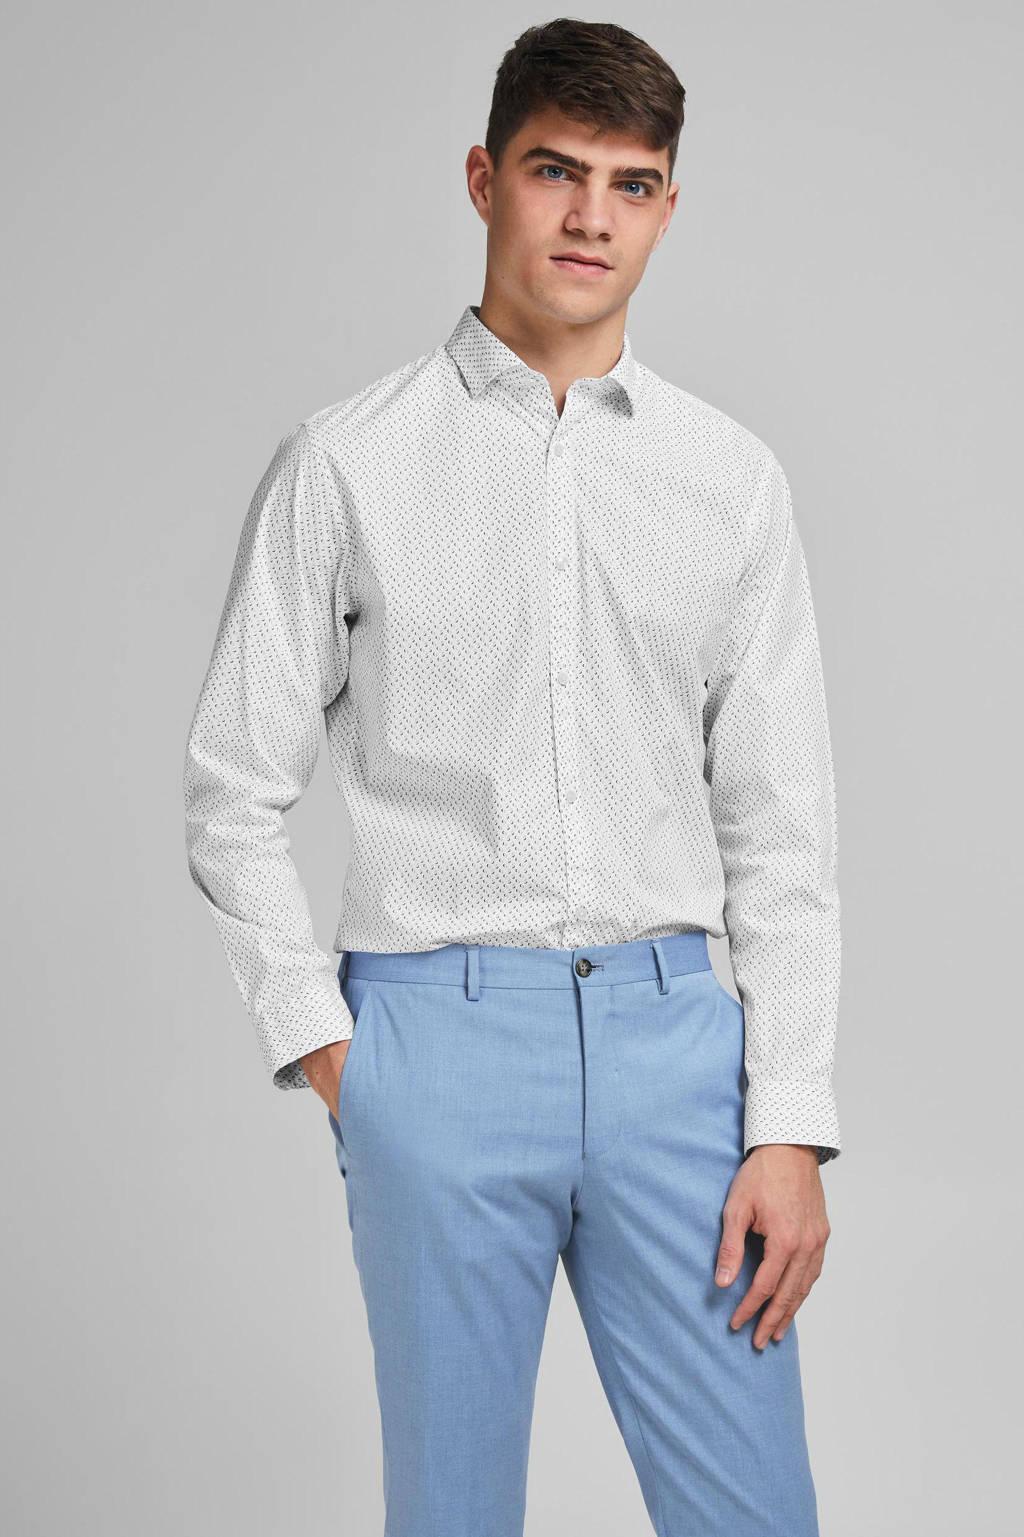 JACK & JONES PREMIUM slim fit overhemd met all over print wit, Wit